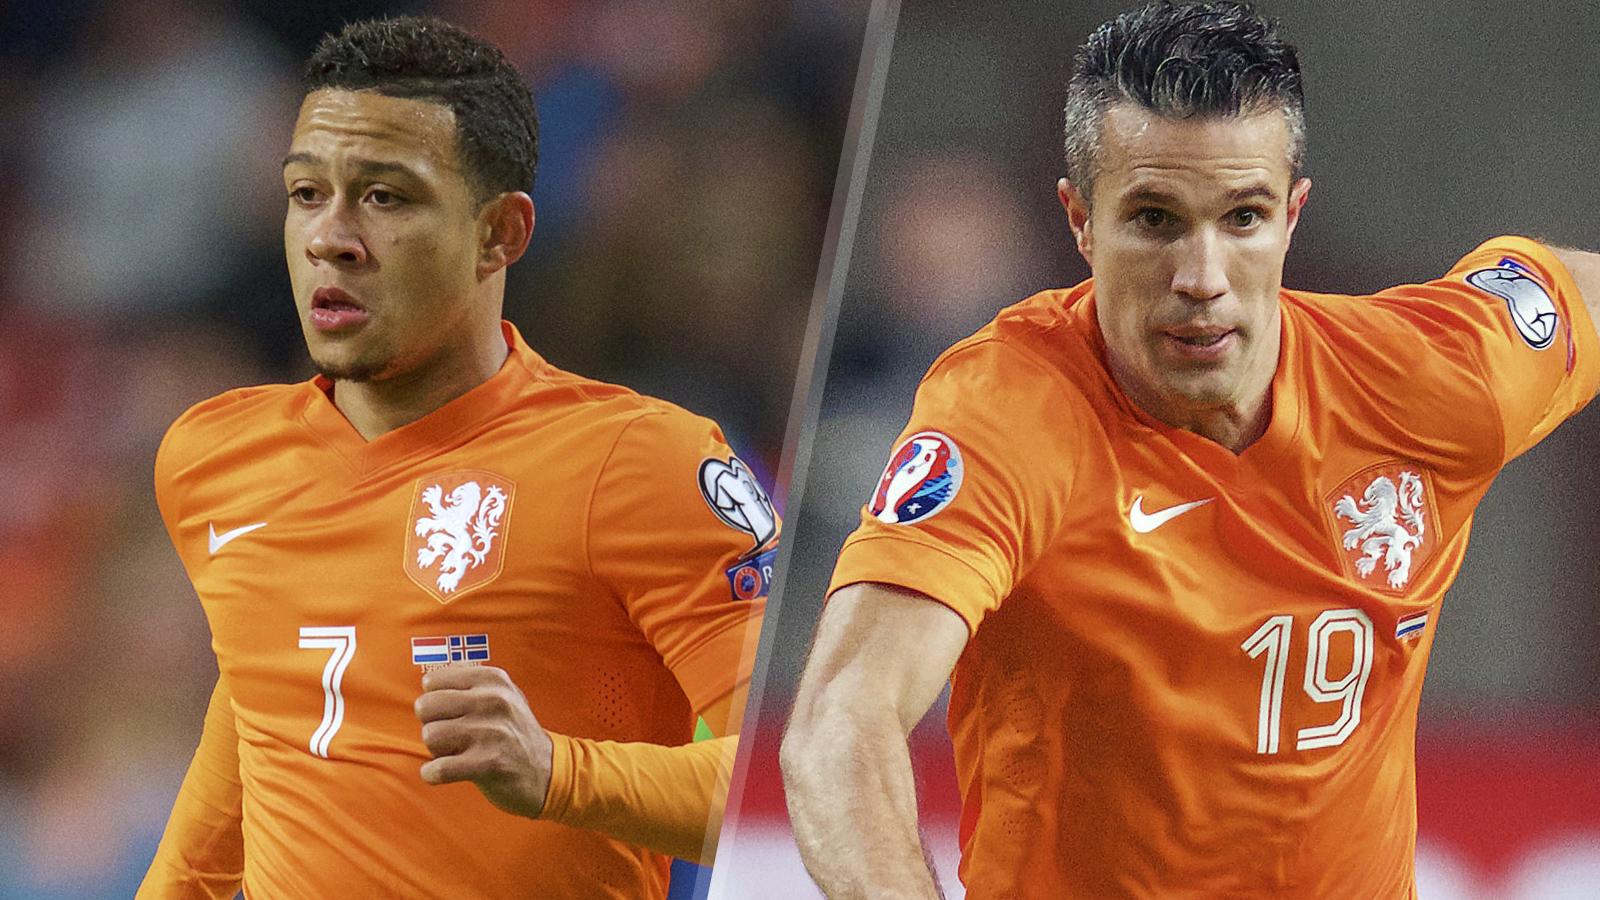 Memphis Depay, Robin van Persie left off Dutch squad for friendlies